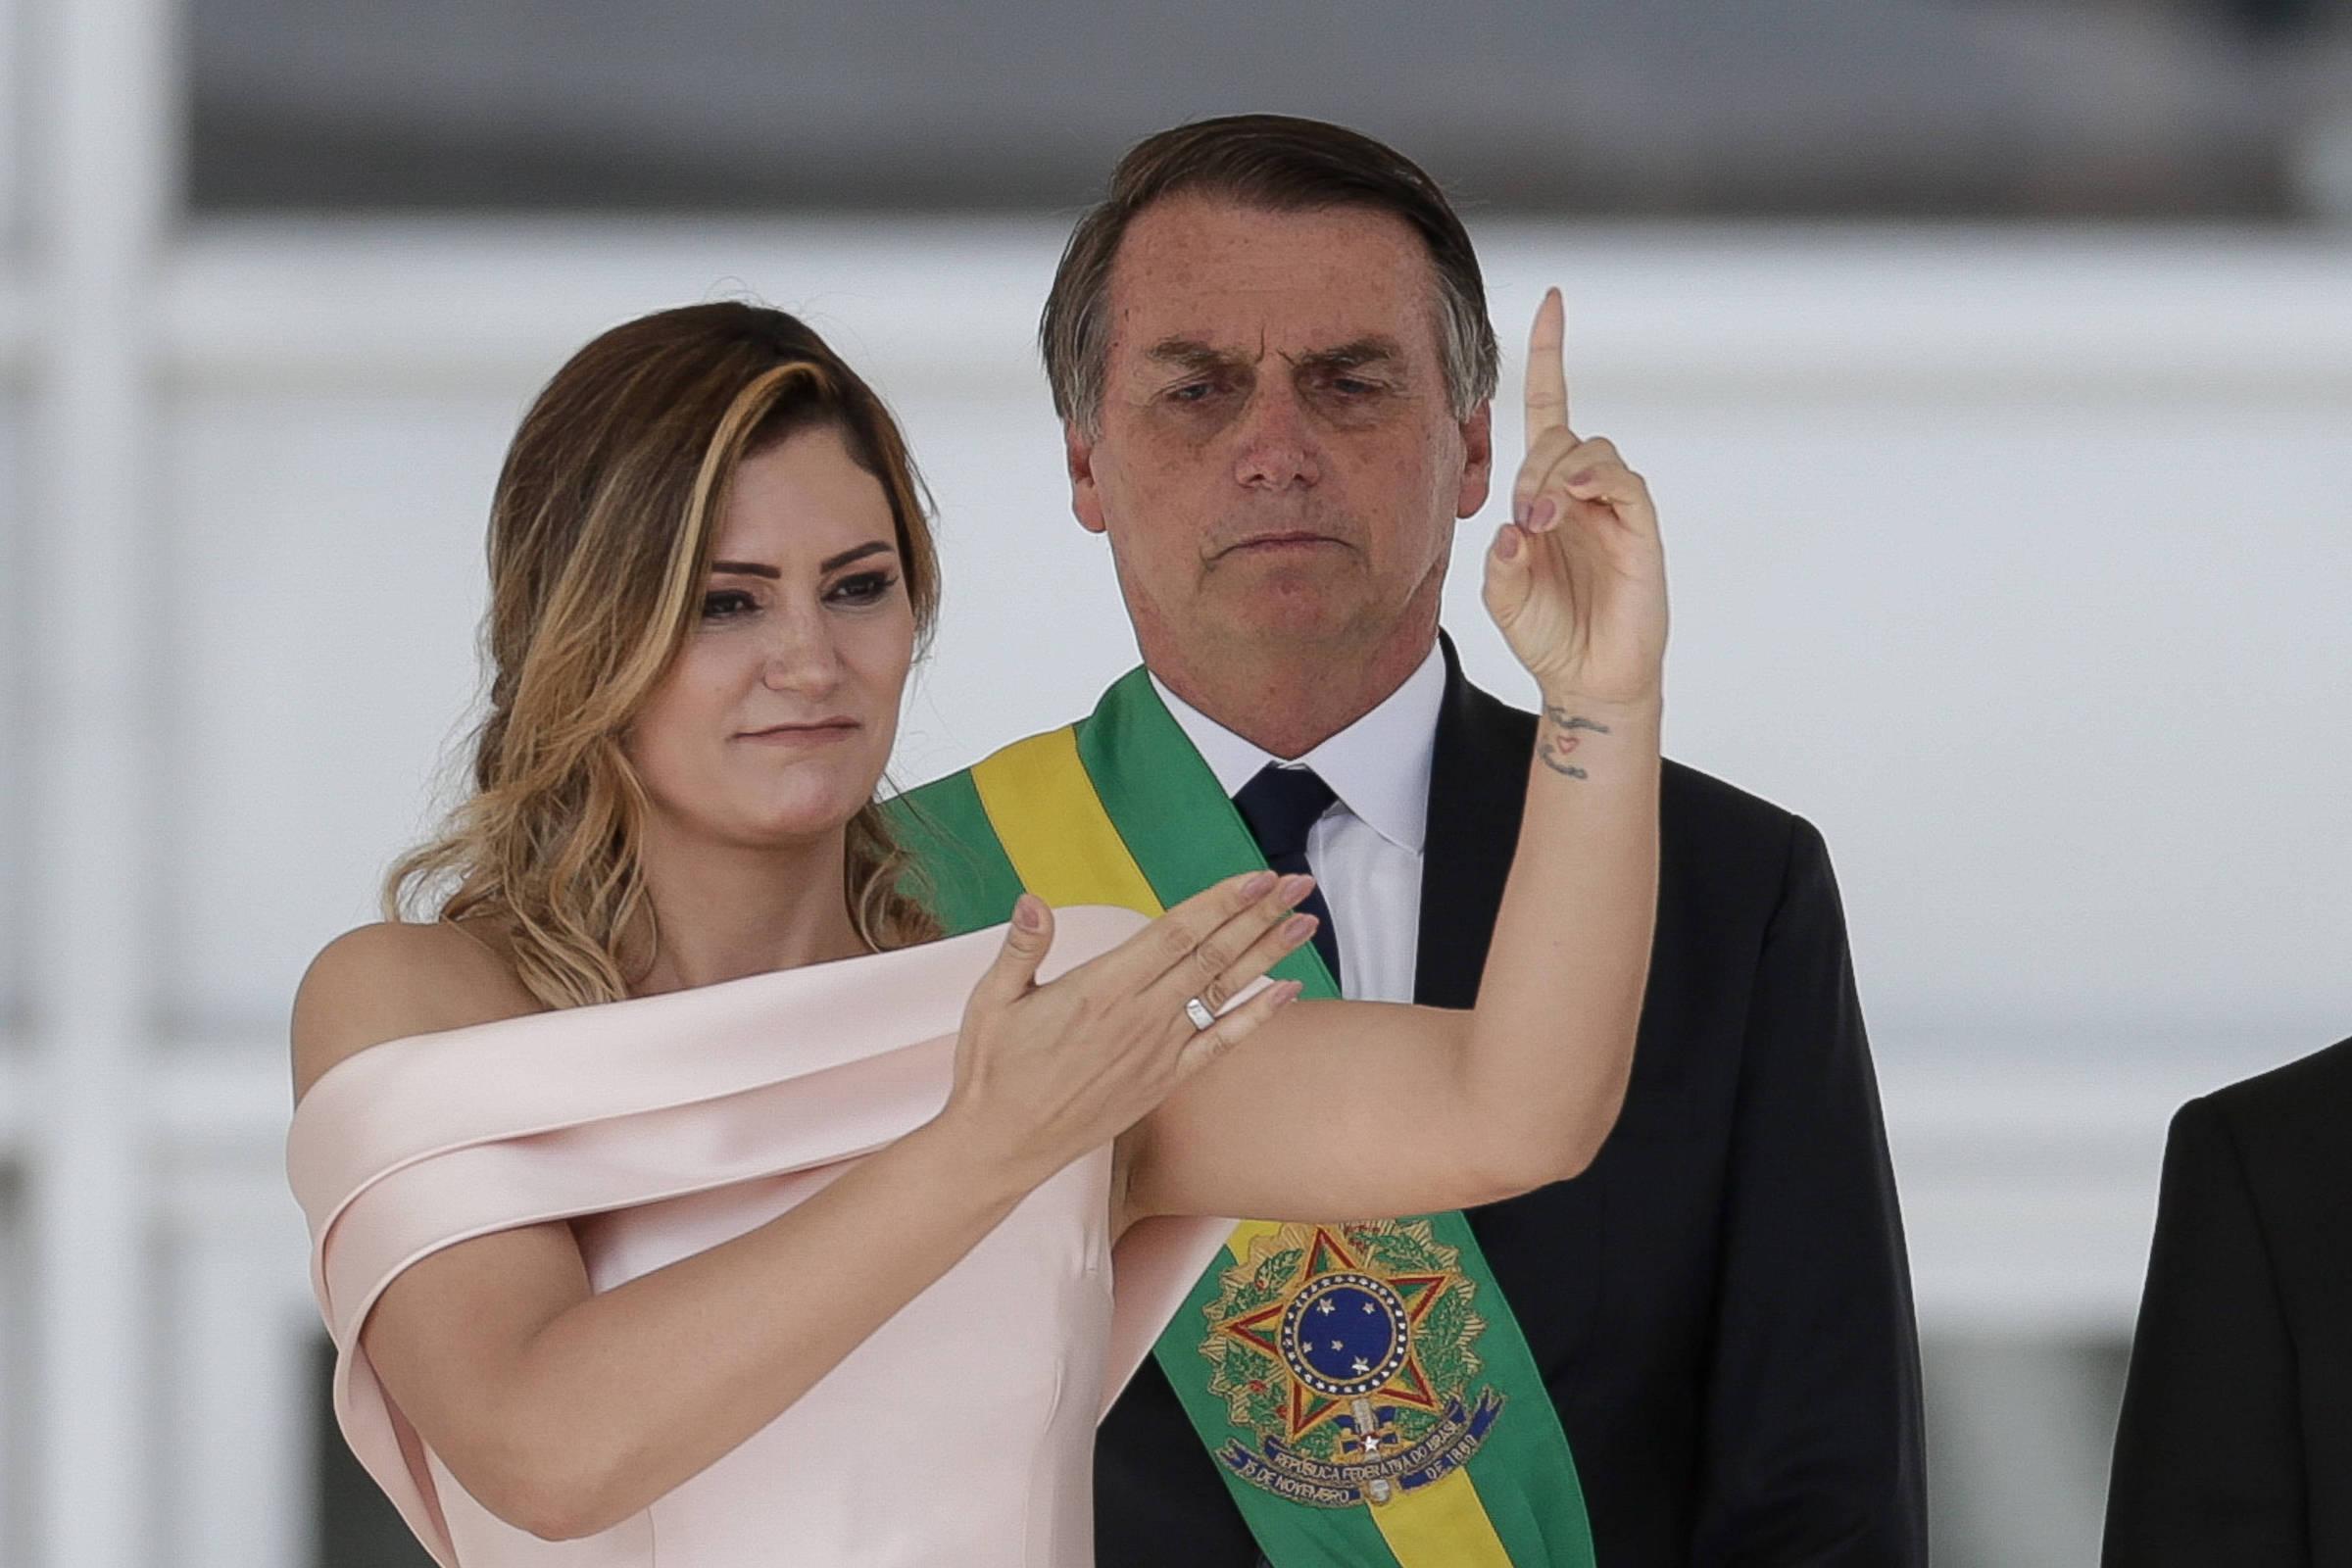 Resultado de imagem para Discurso de Michelle Bolsonaro em Libras teve grande destaque no Twitter globalmente